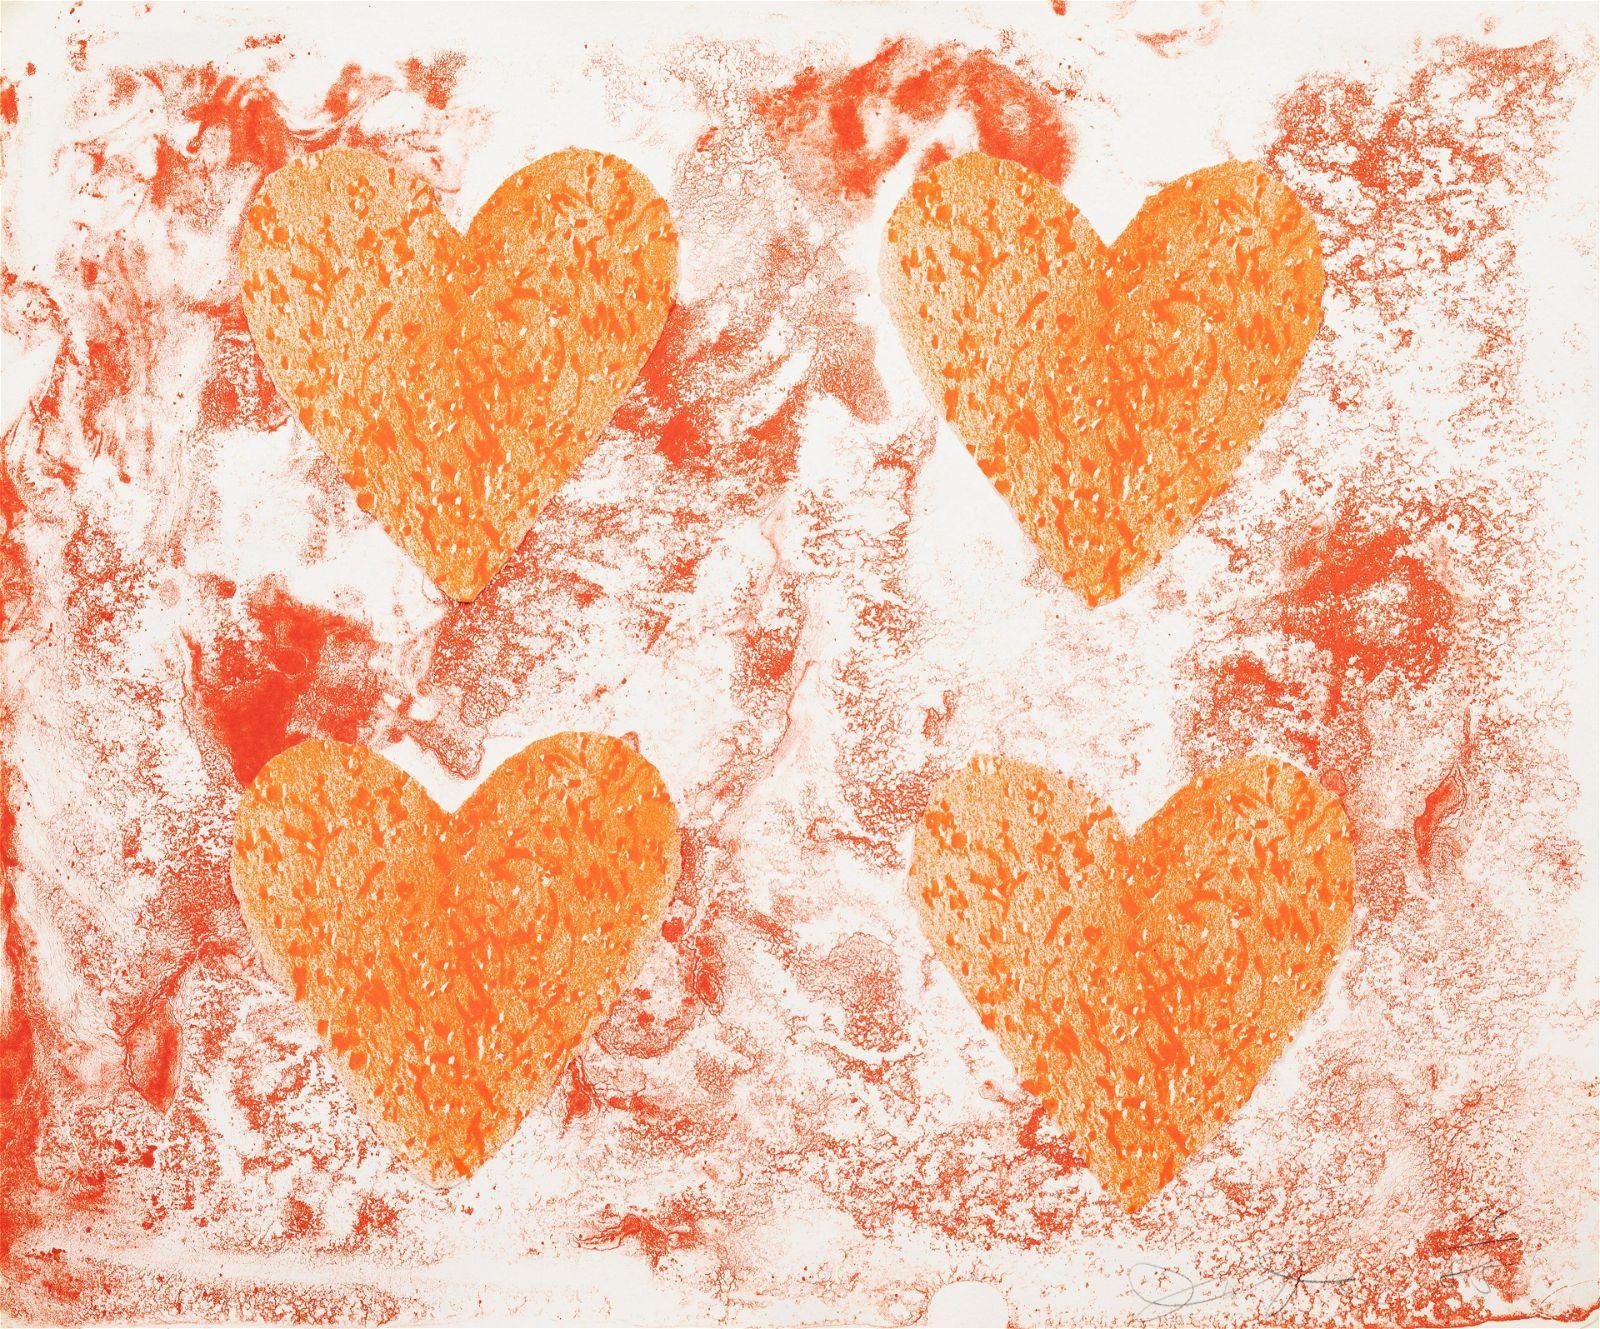 Jim Dine (American, b. 1935) Dutch Hearts, 1970